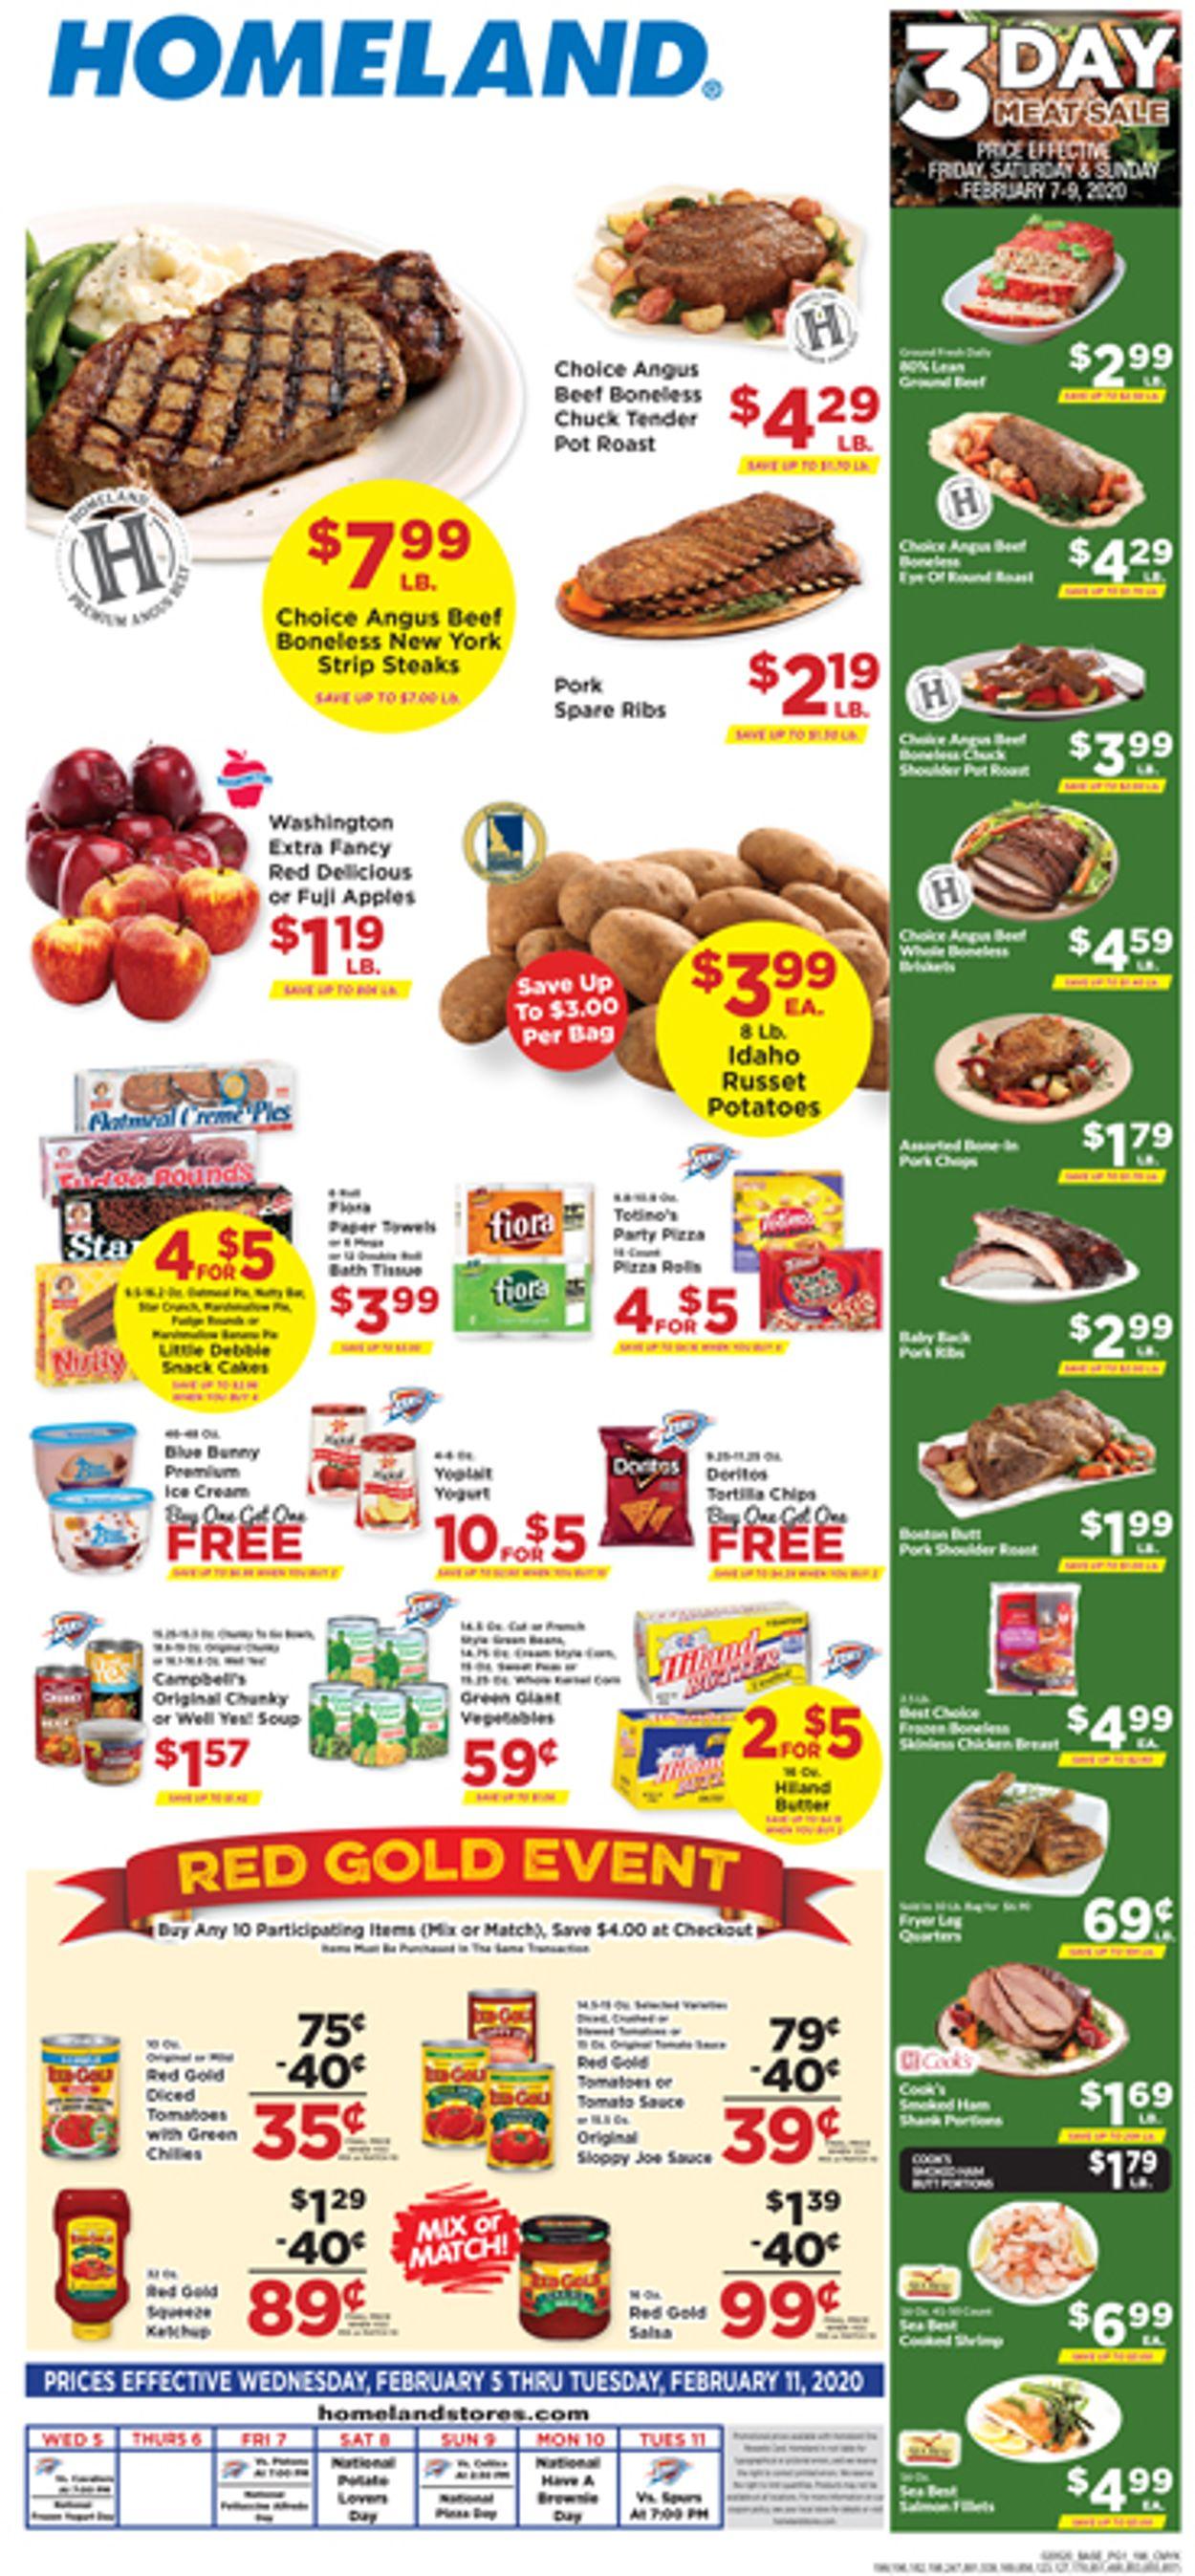 Homeland Weekly Ad Circular - valid 02/05-02/11/2020